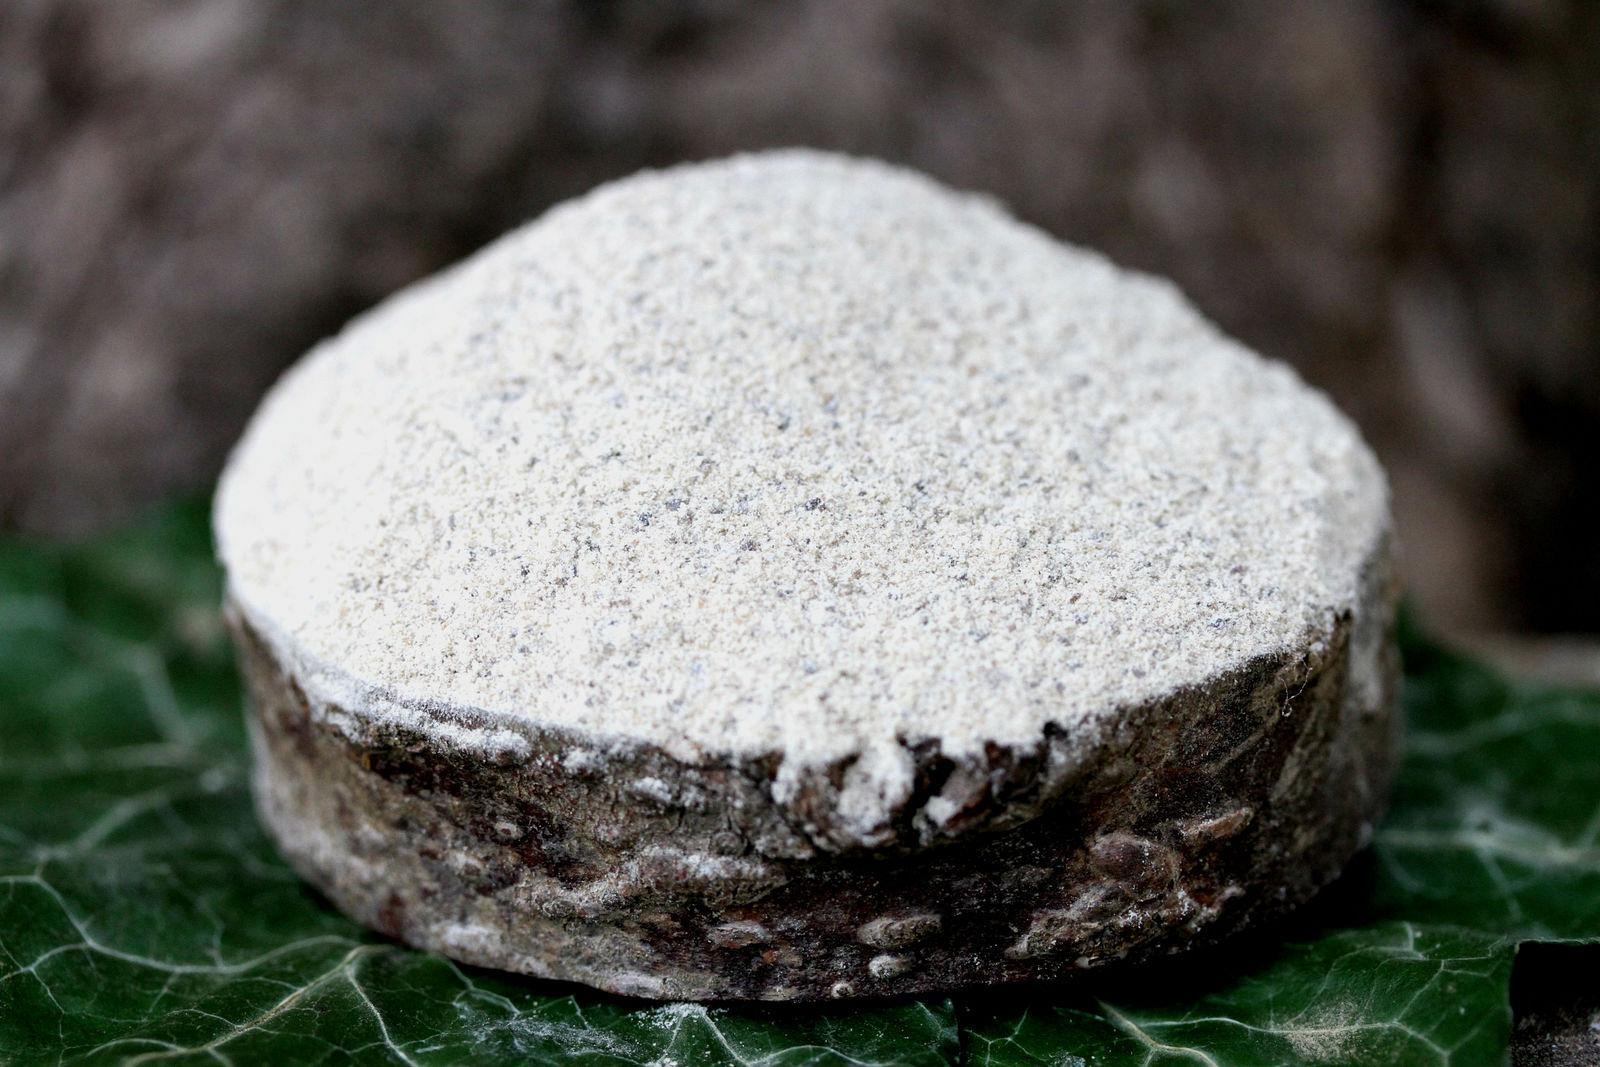 3 5 g Benzoin Gum Powder (Styrax benzoin) Wildharvested and Kosher Certified